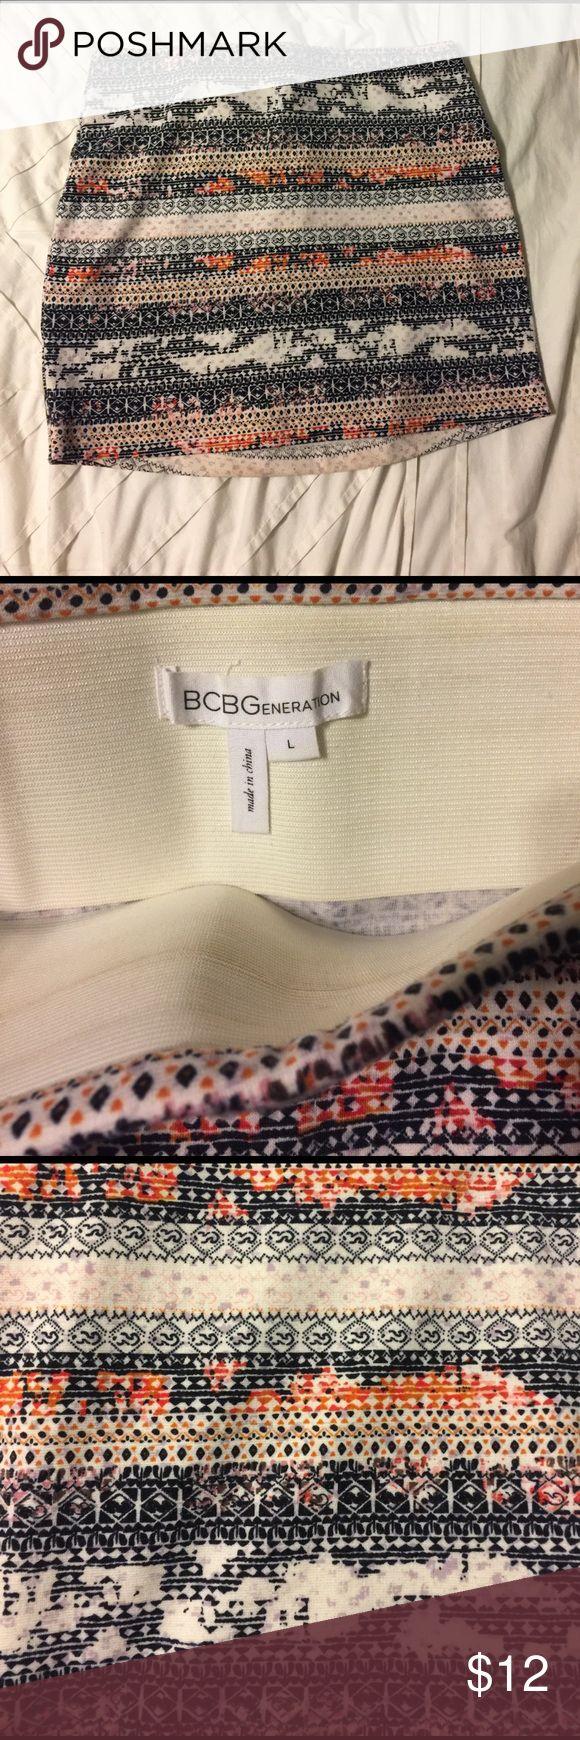 BCBG Generation Skirt Size L BCBGeneration Skirt. Barely worn. BCBGeneration Skirts Mini